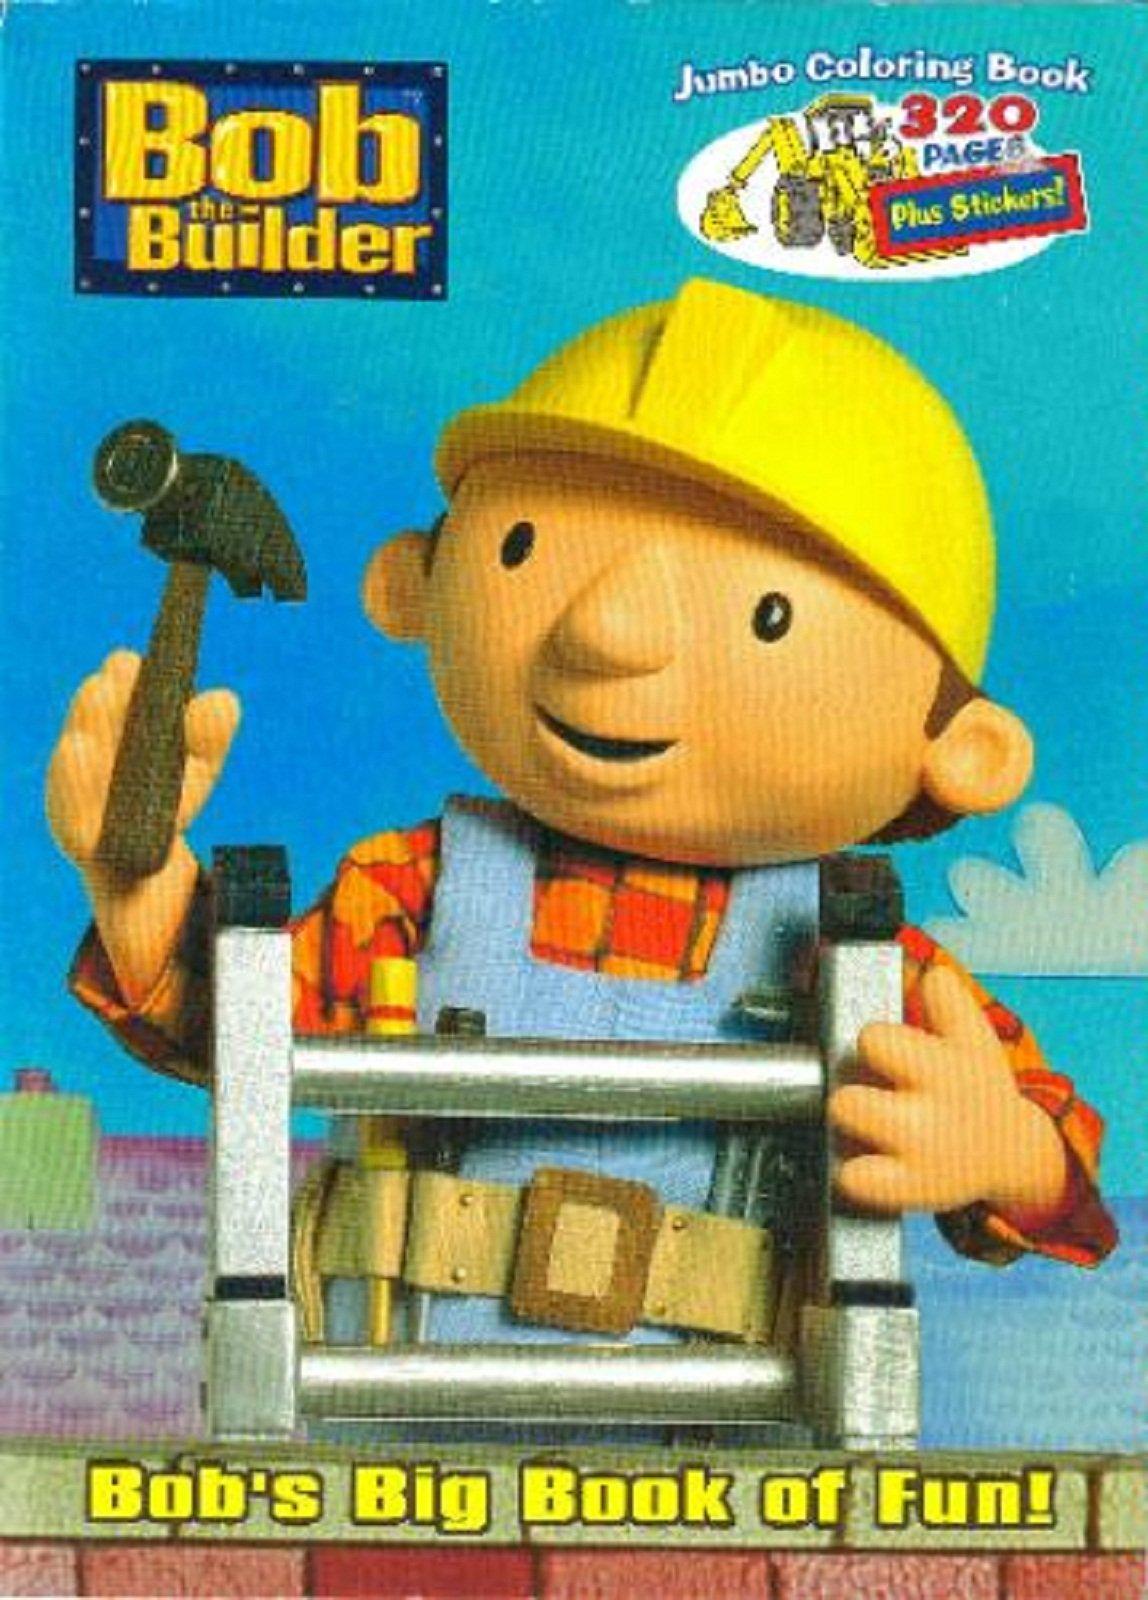 Download Bob the Builder: Bob's Big Book of Fun! (Bob the Builder Jumbo Coloring Books) ebook